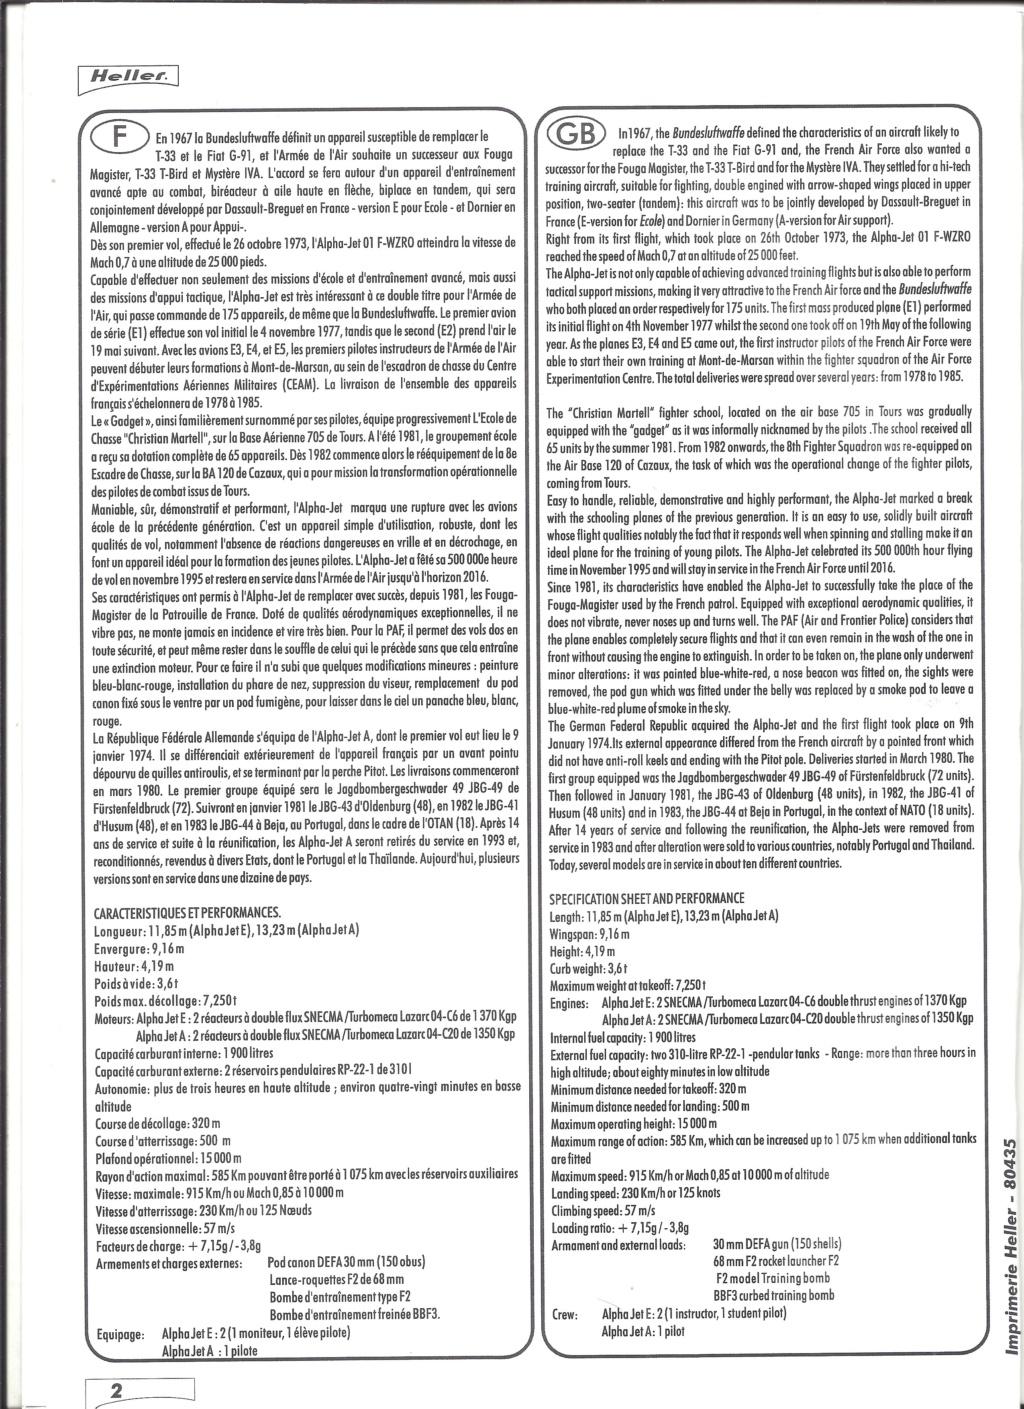 DASSAULT-BREGUET / DORNIER ALPHA JET 1/48ème Réf 80435 Notice Helle657